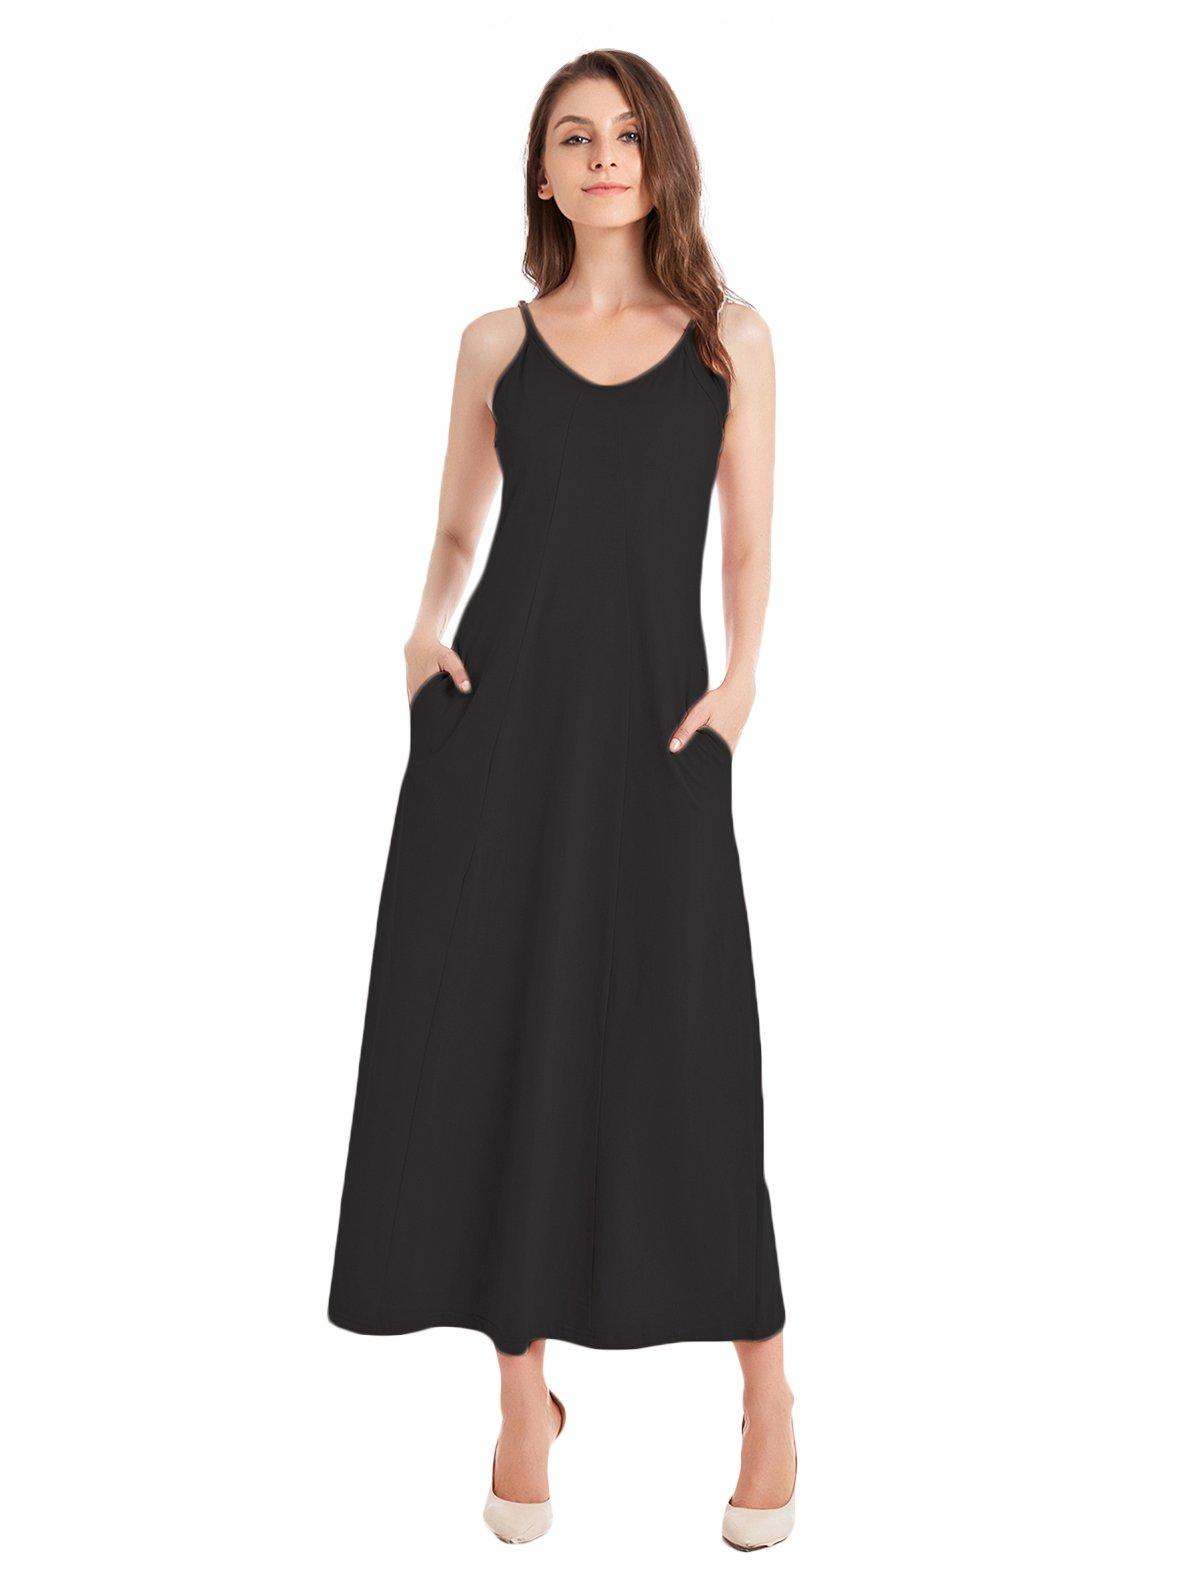 TOTOFITS Women's Summer Beach Cotton Knit Casual Long Maxi Dress Spaghetti Strap Sleeveless Slip Cami Sundress with Pockets (Black, M)